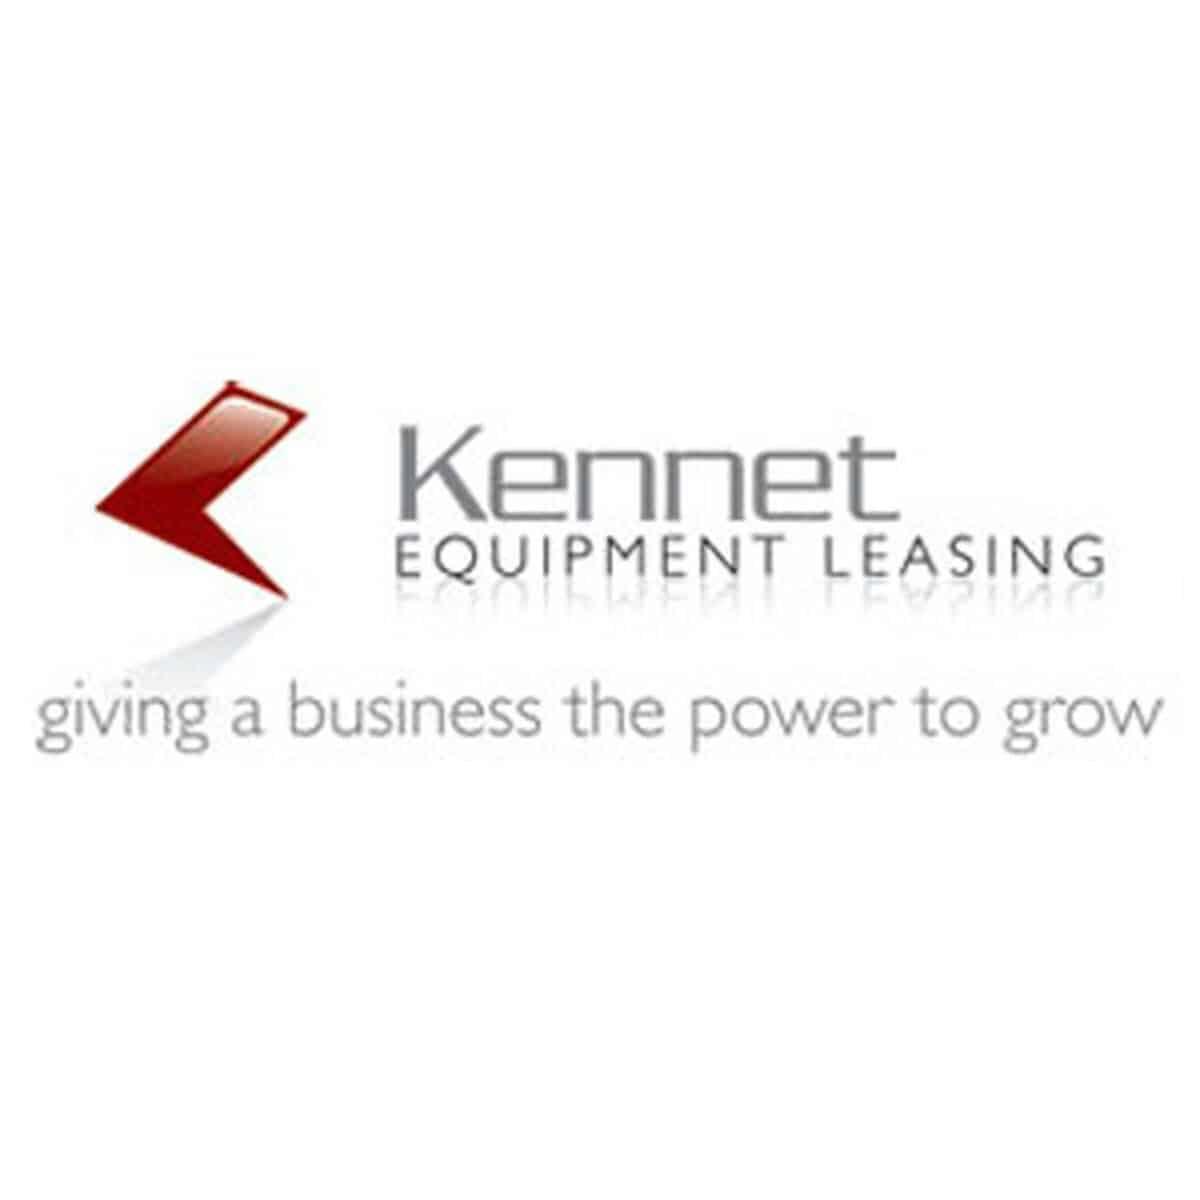 Kennet Equipment Leasing